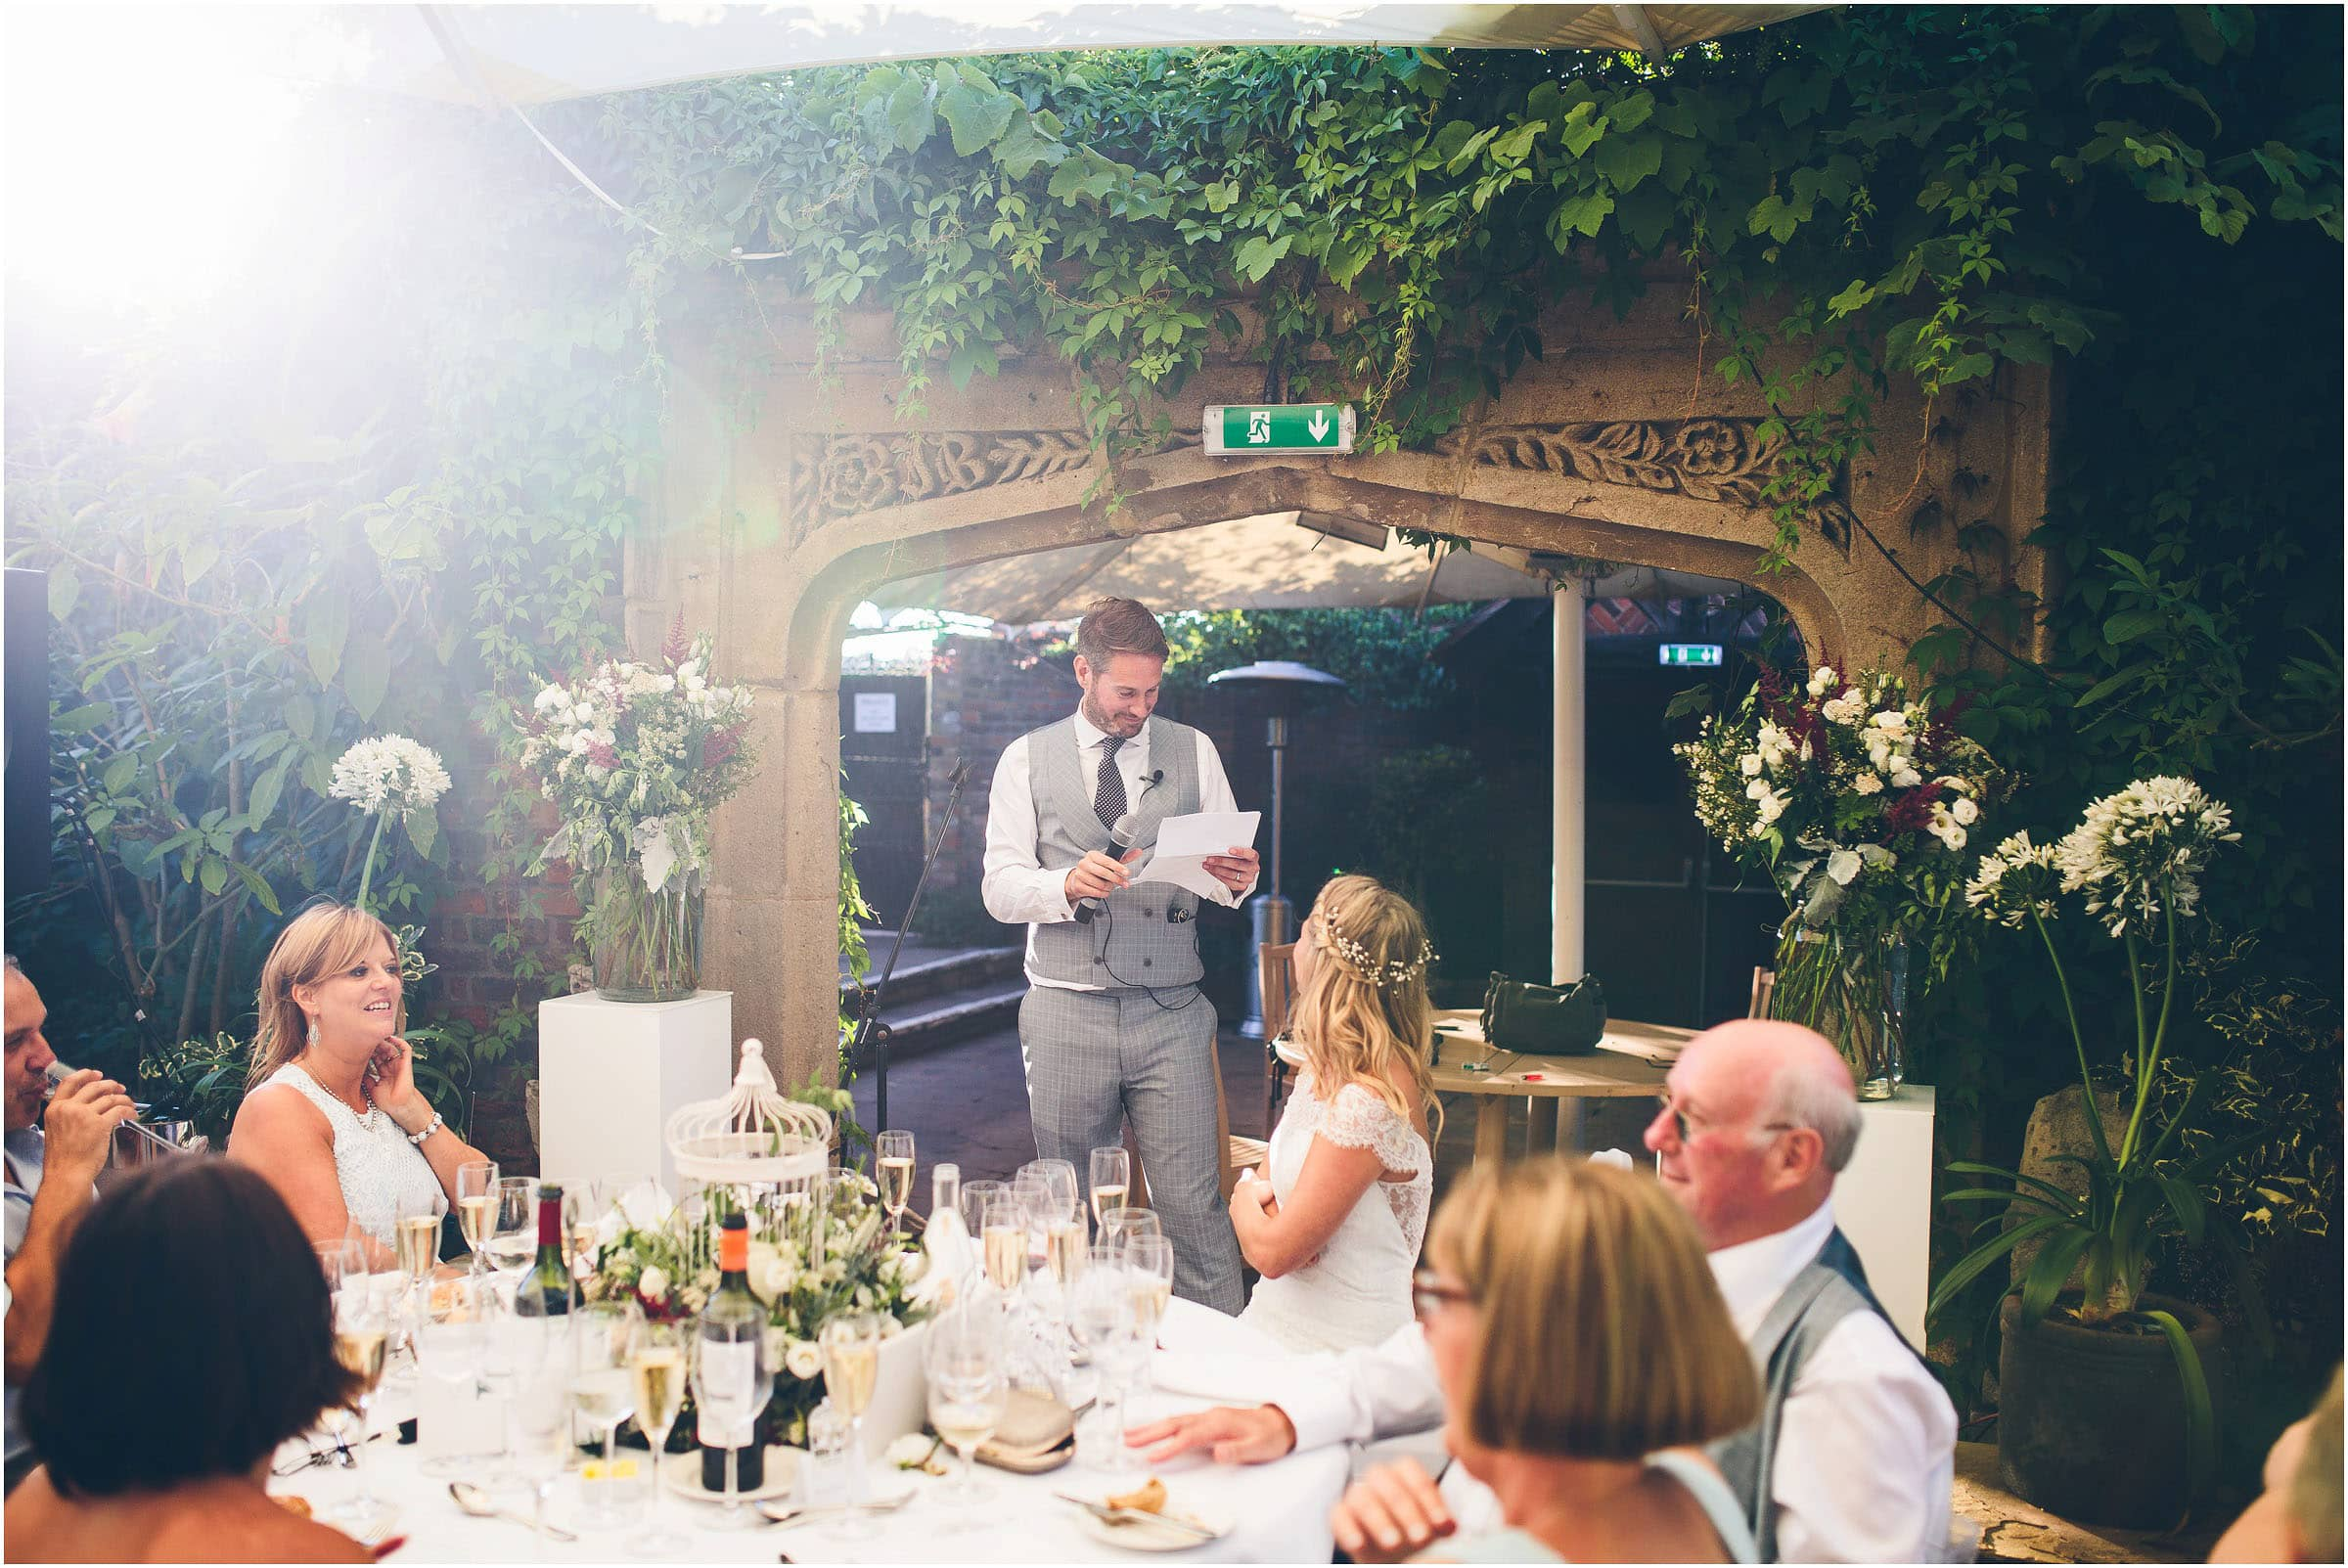 Kensington_Roof_Gardens_Wedding_Photography_0098